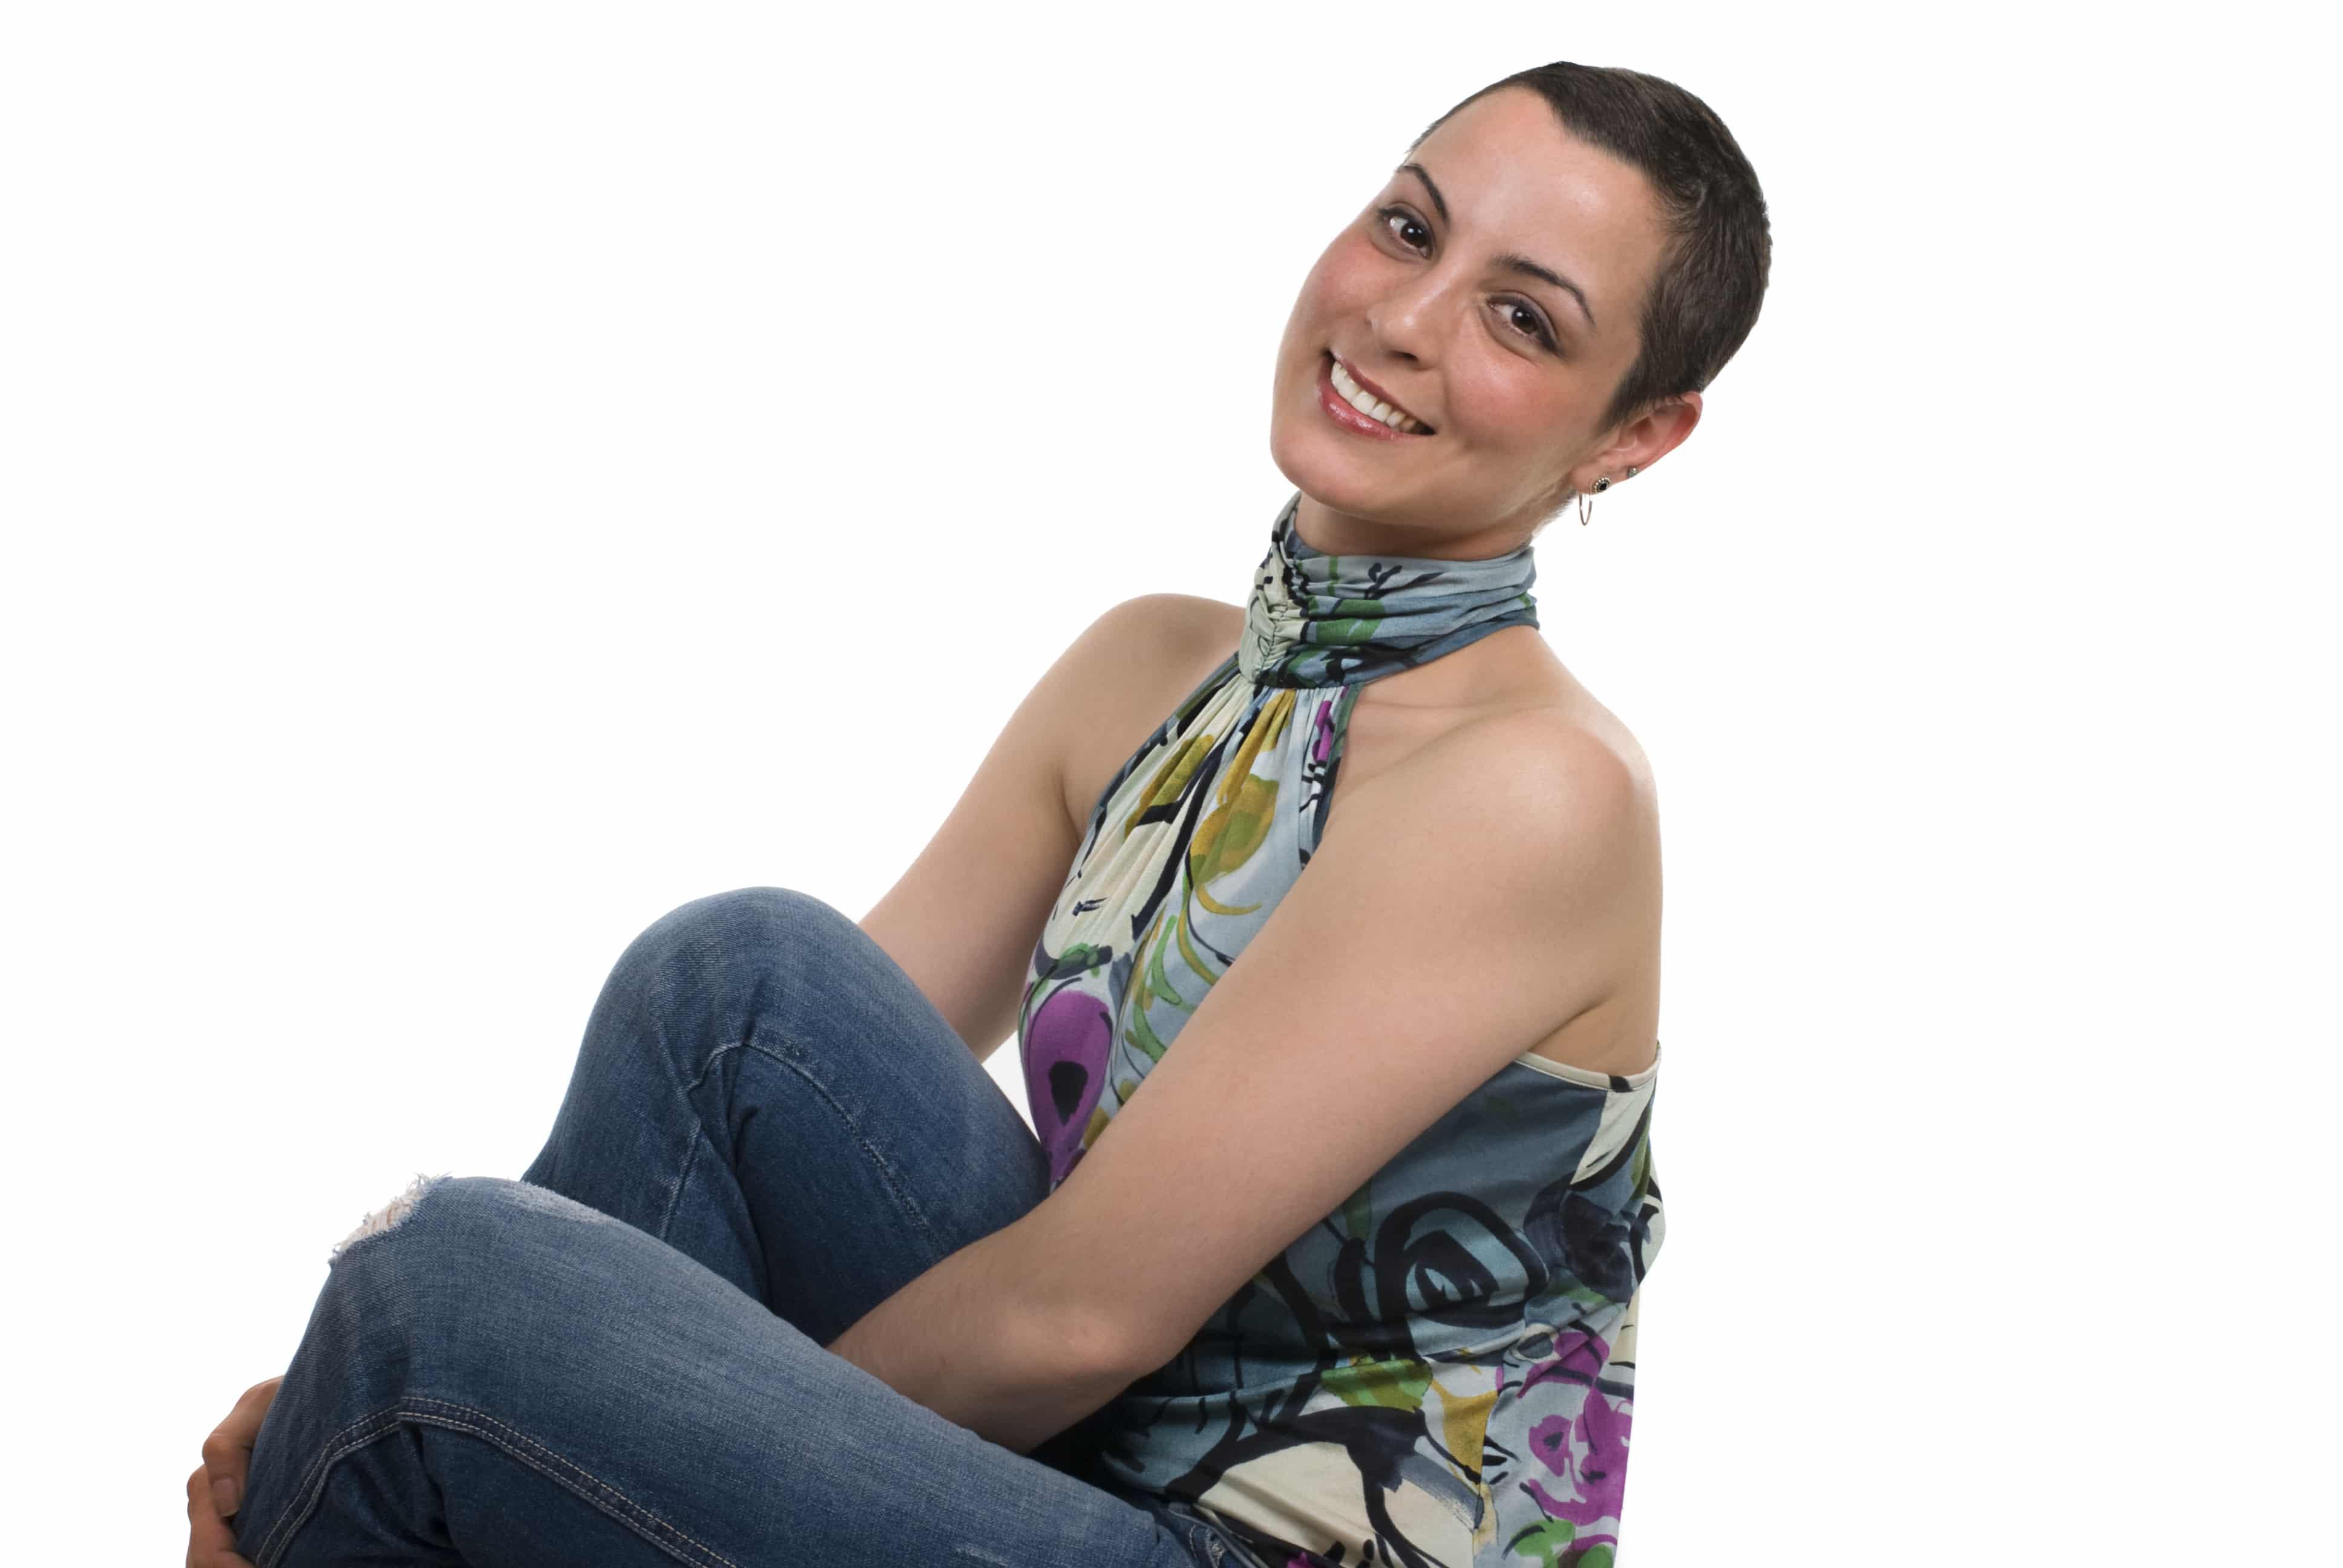 Best Orlando Cancer Salon For Hair Care Skincare Is Bonne Vie Salon